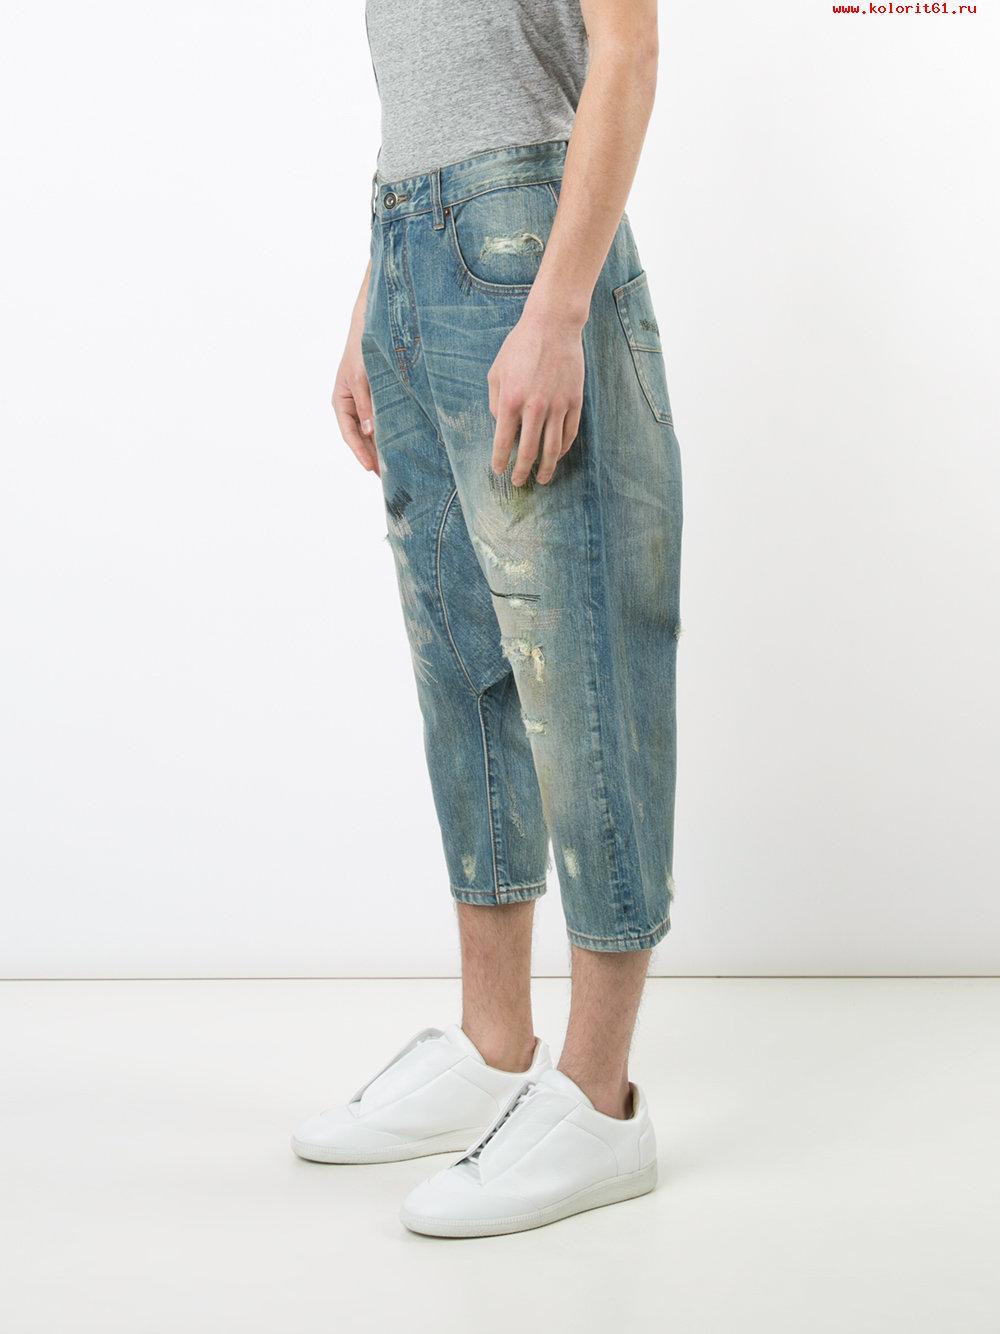 Суперские штаны